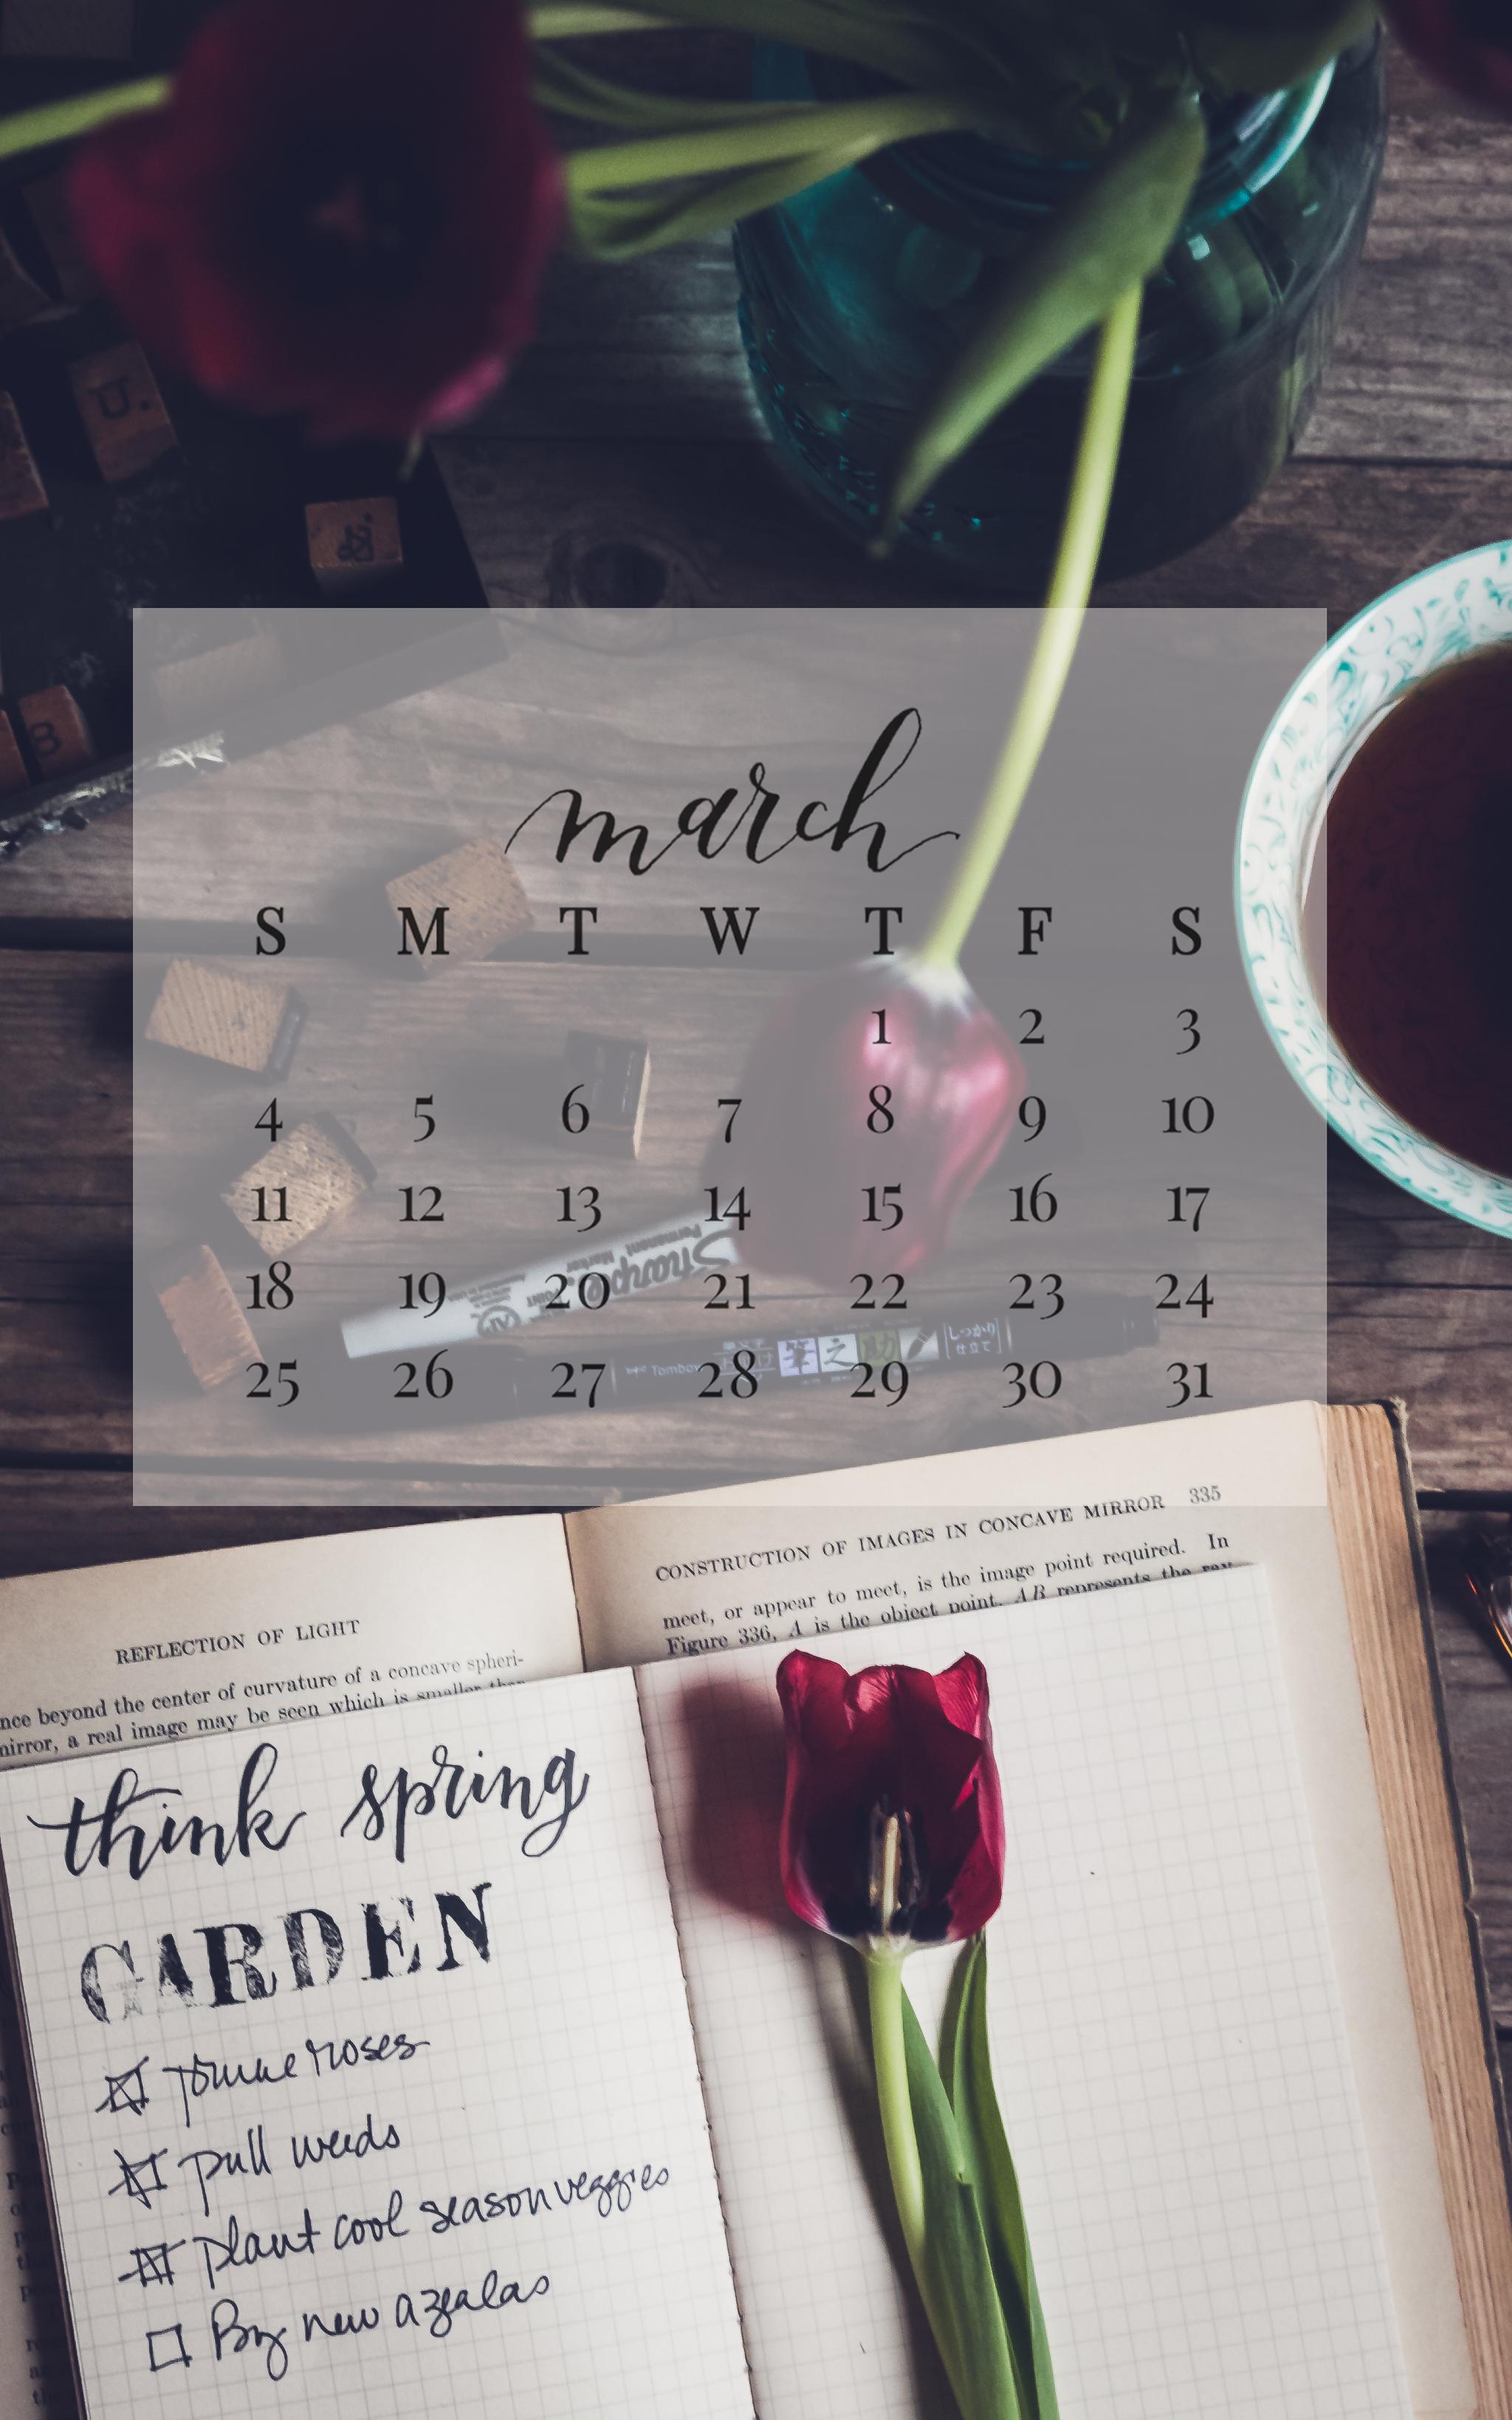 March 2018 Device Calendar